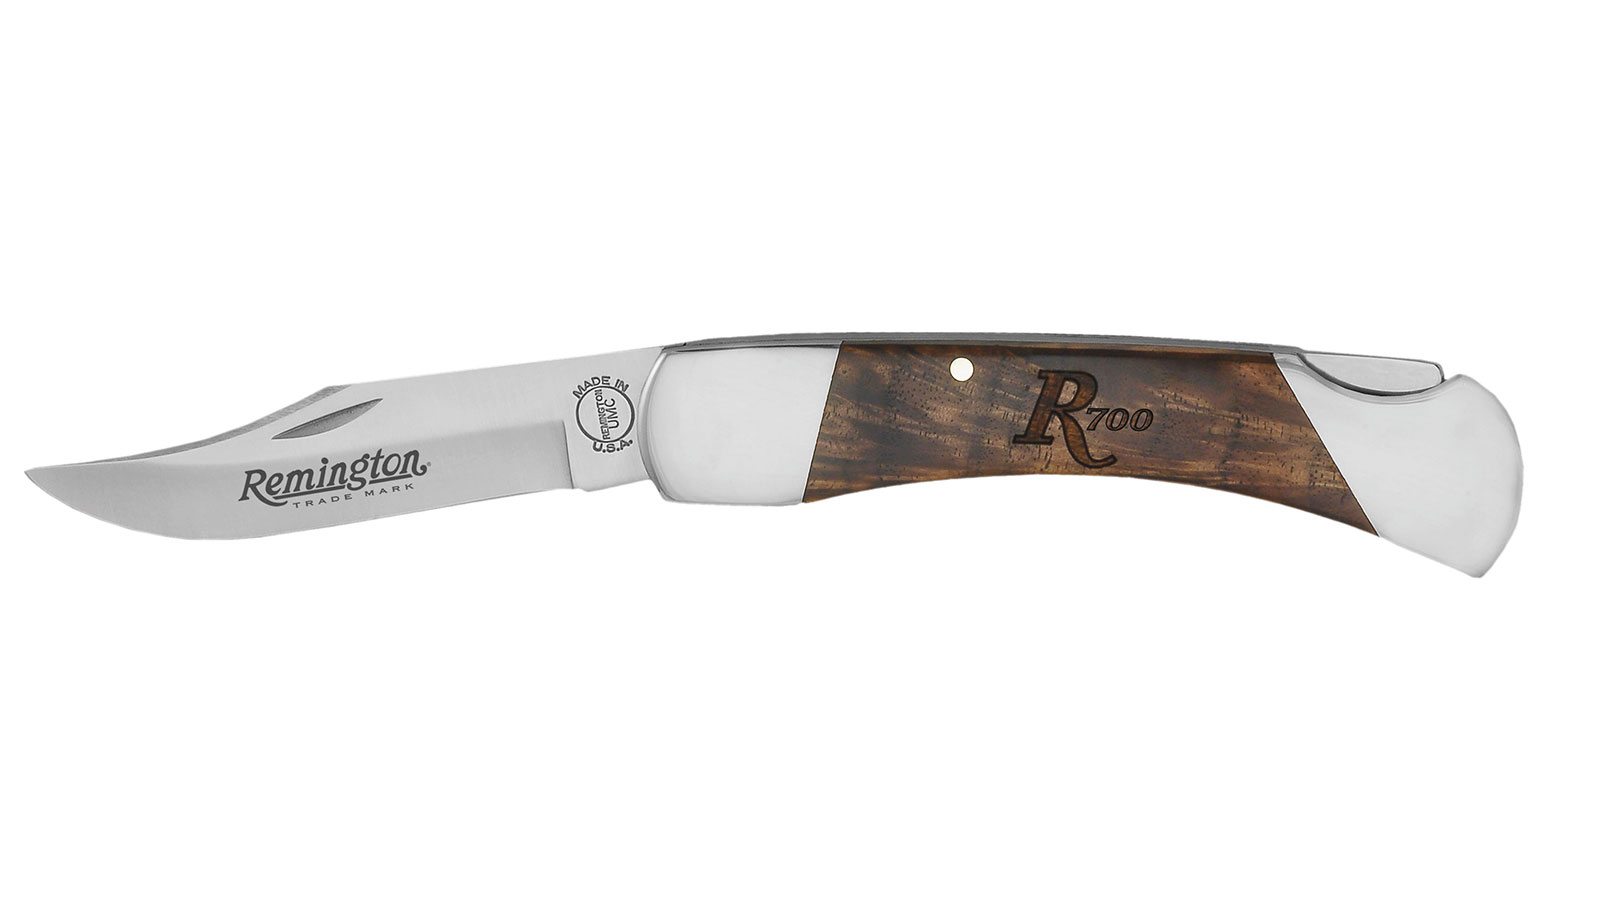 Remington 19979 Heritage Line Cutler